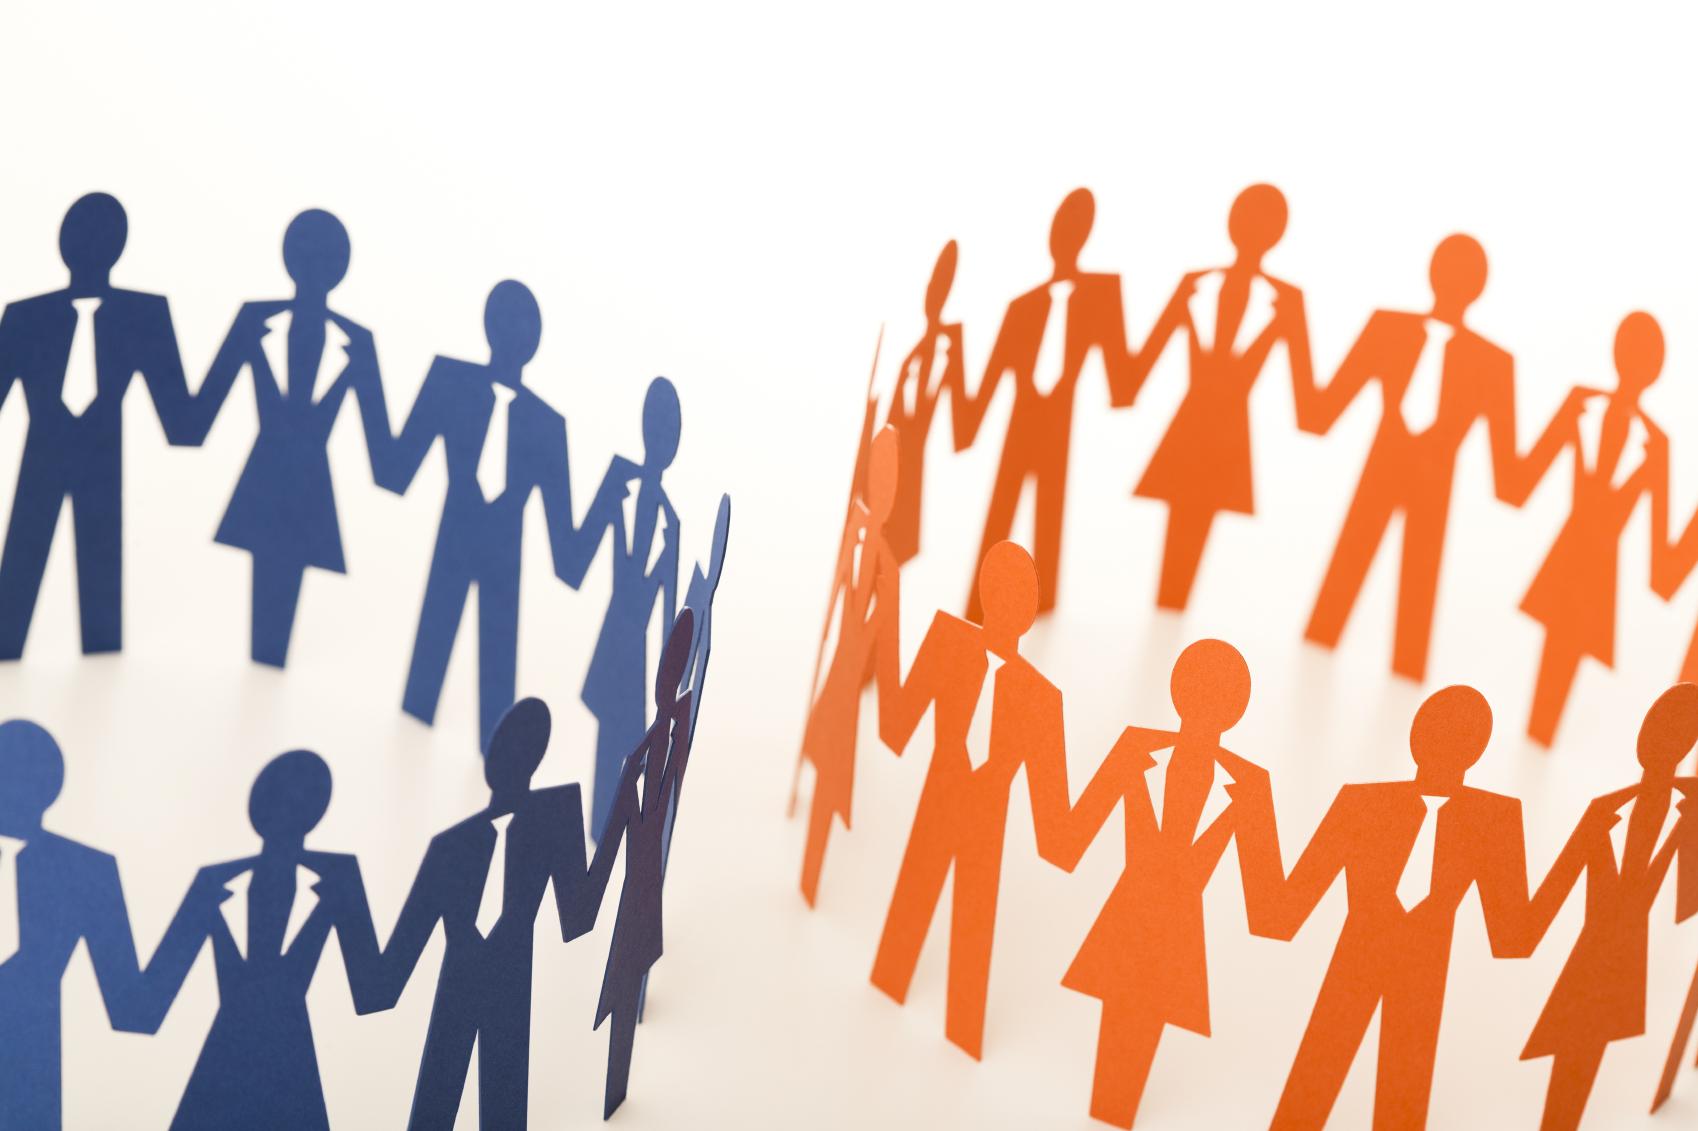 Case Study - Turning Transactional Vendors into Strategic Partners